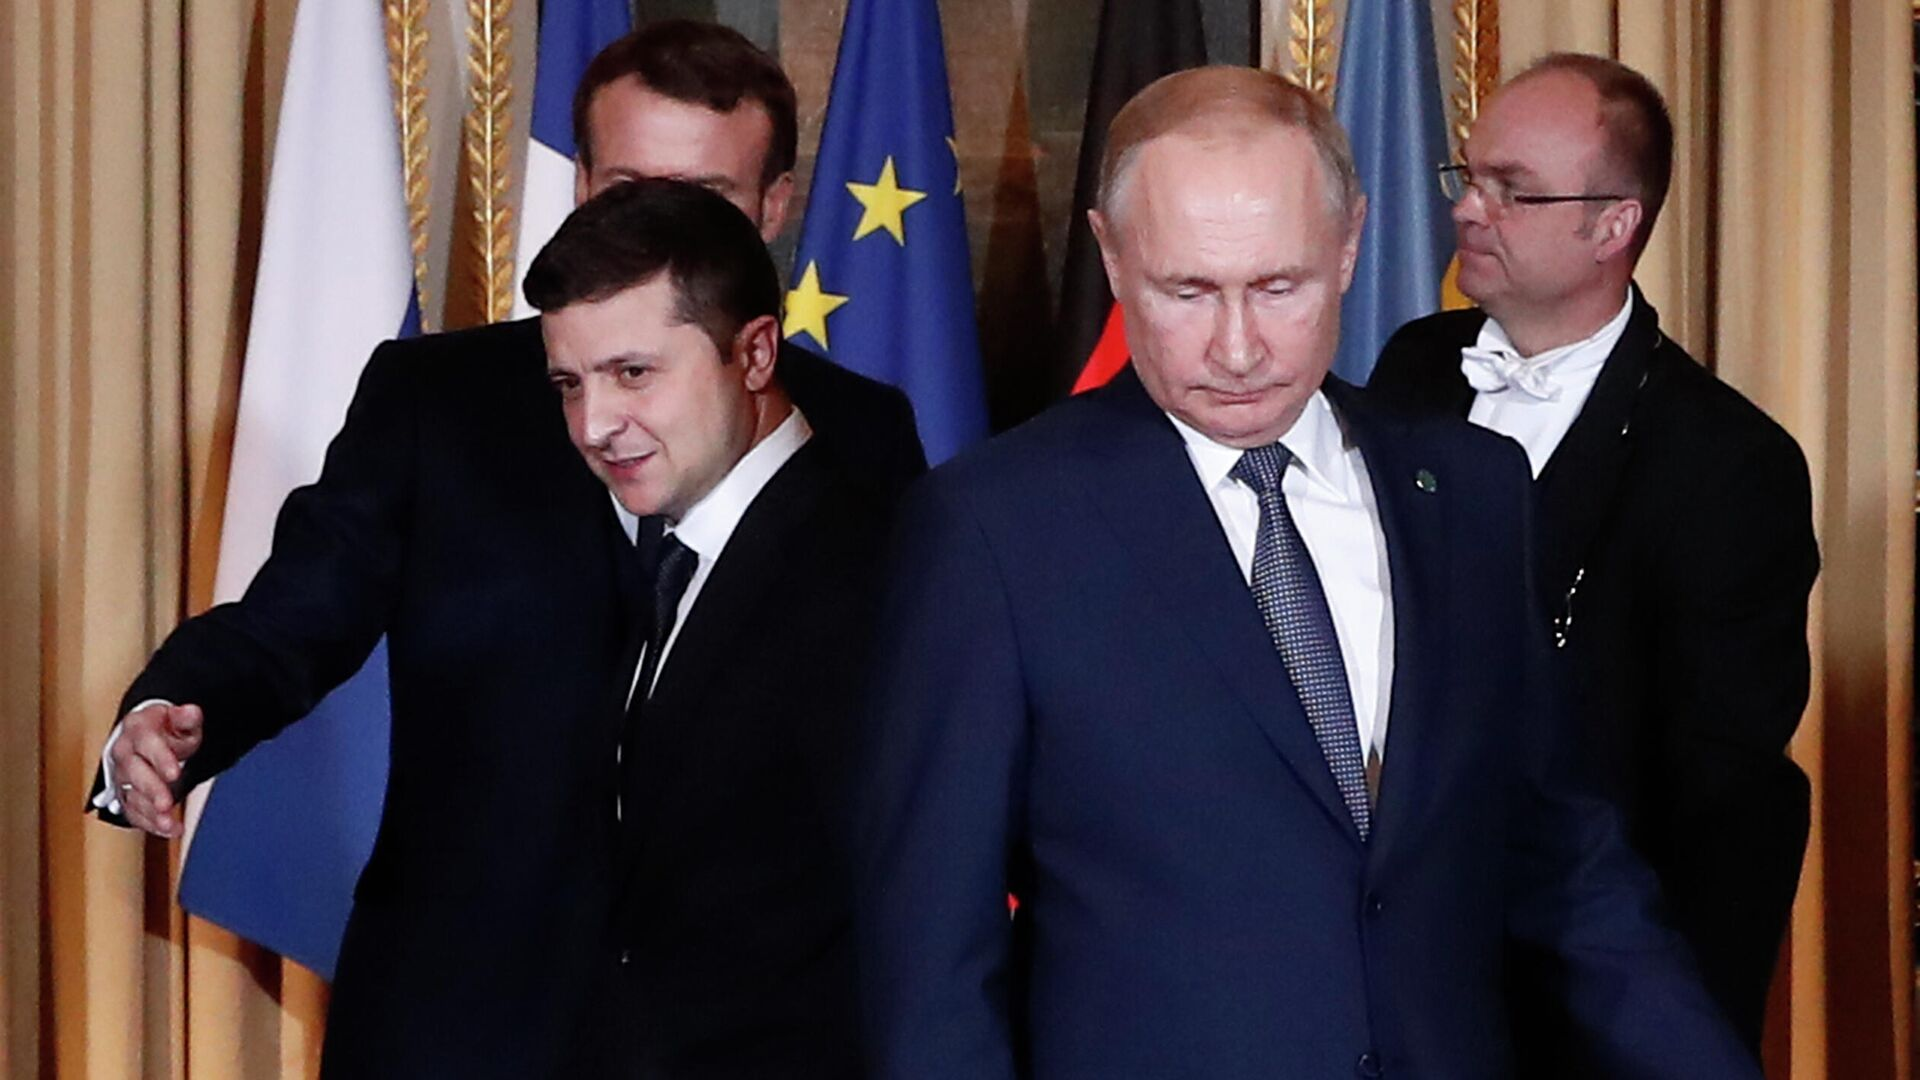 Президент России Владимир Путин (справа) и президент Украины Владимир Зеленский на саммите в Париже - РИА Новости, 1920, 28.04.2021